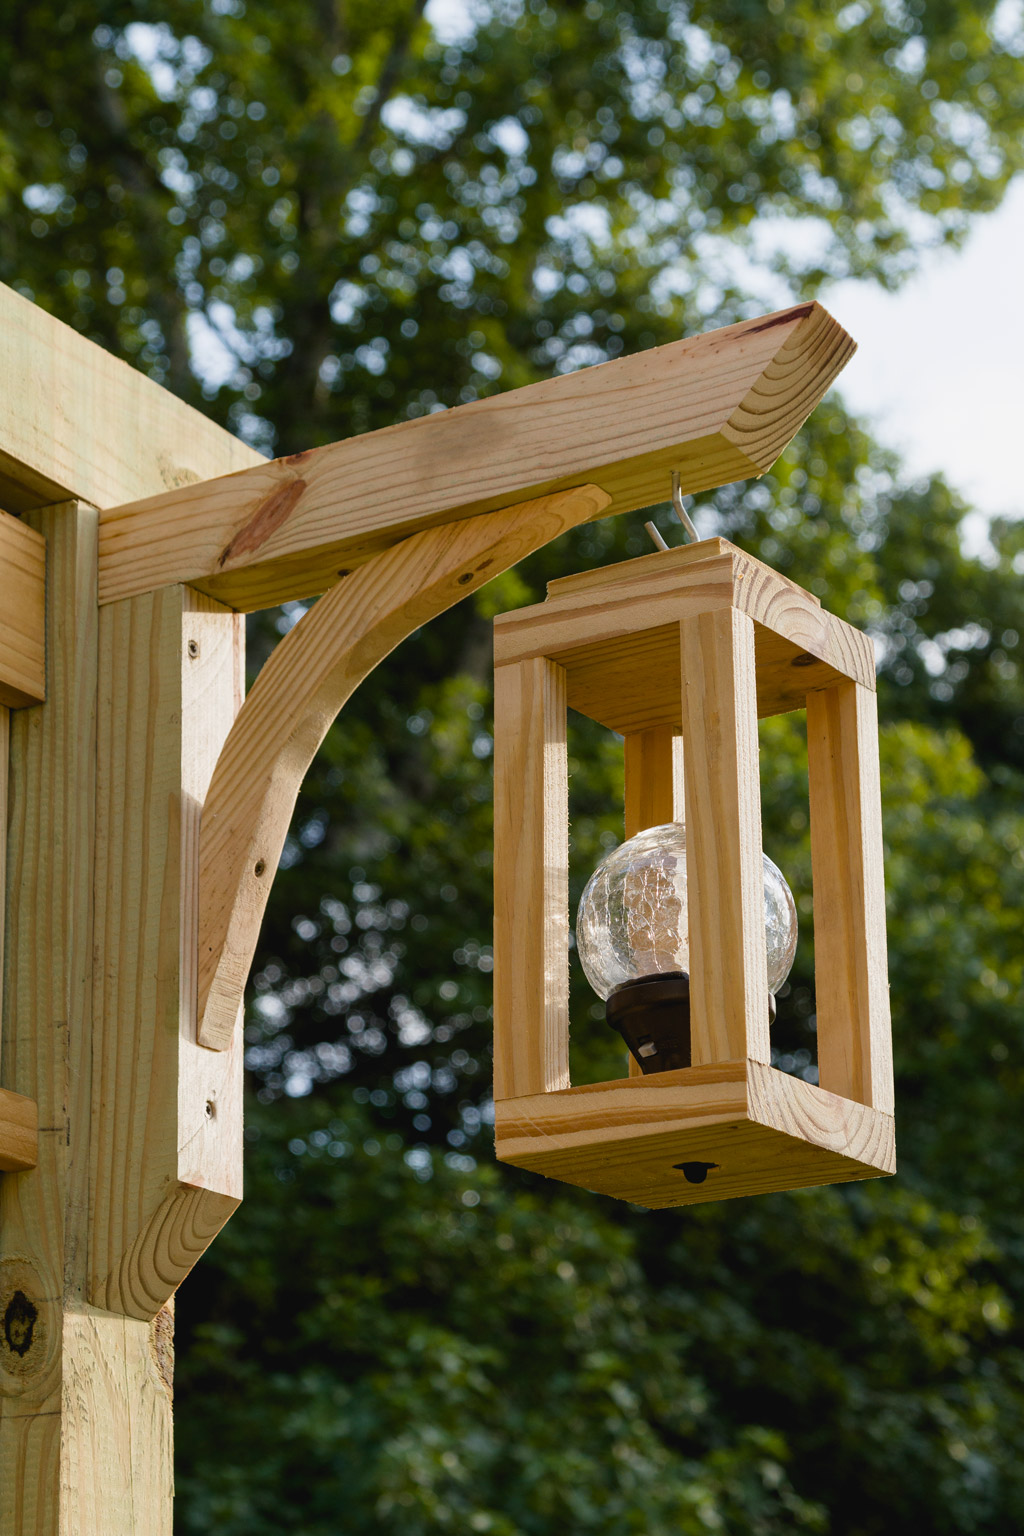 DIY wood solar lanterns